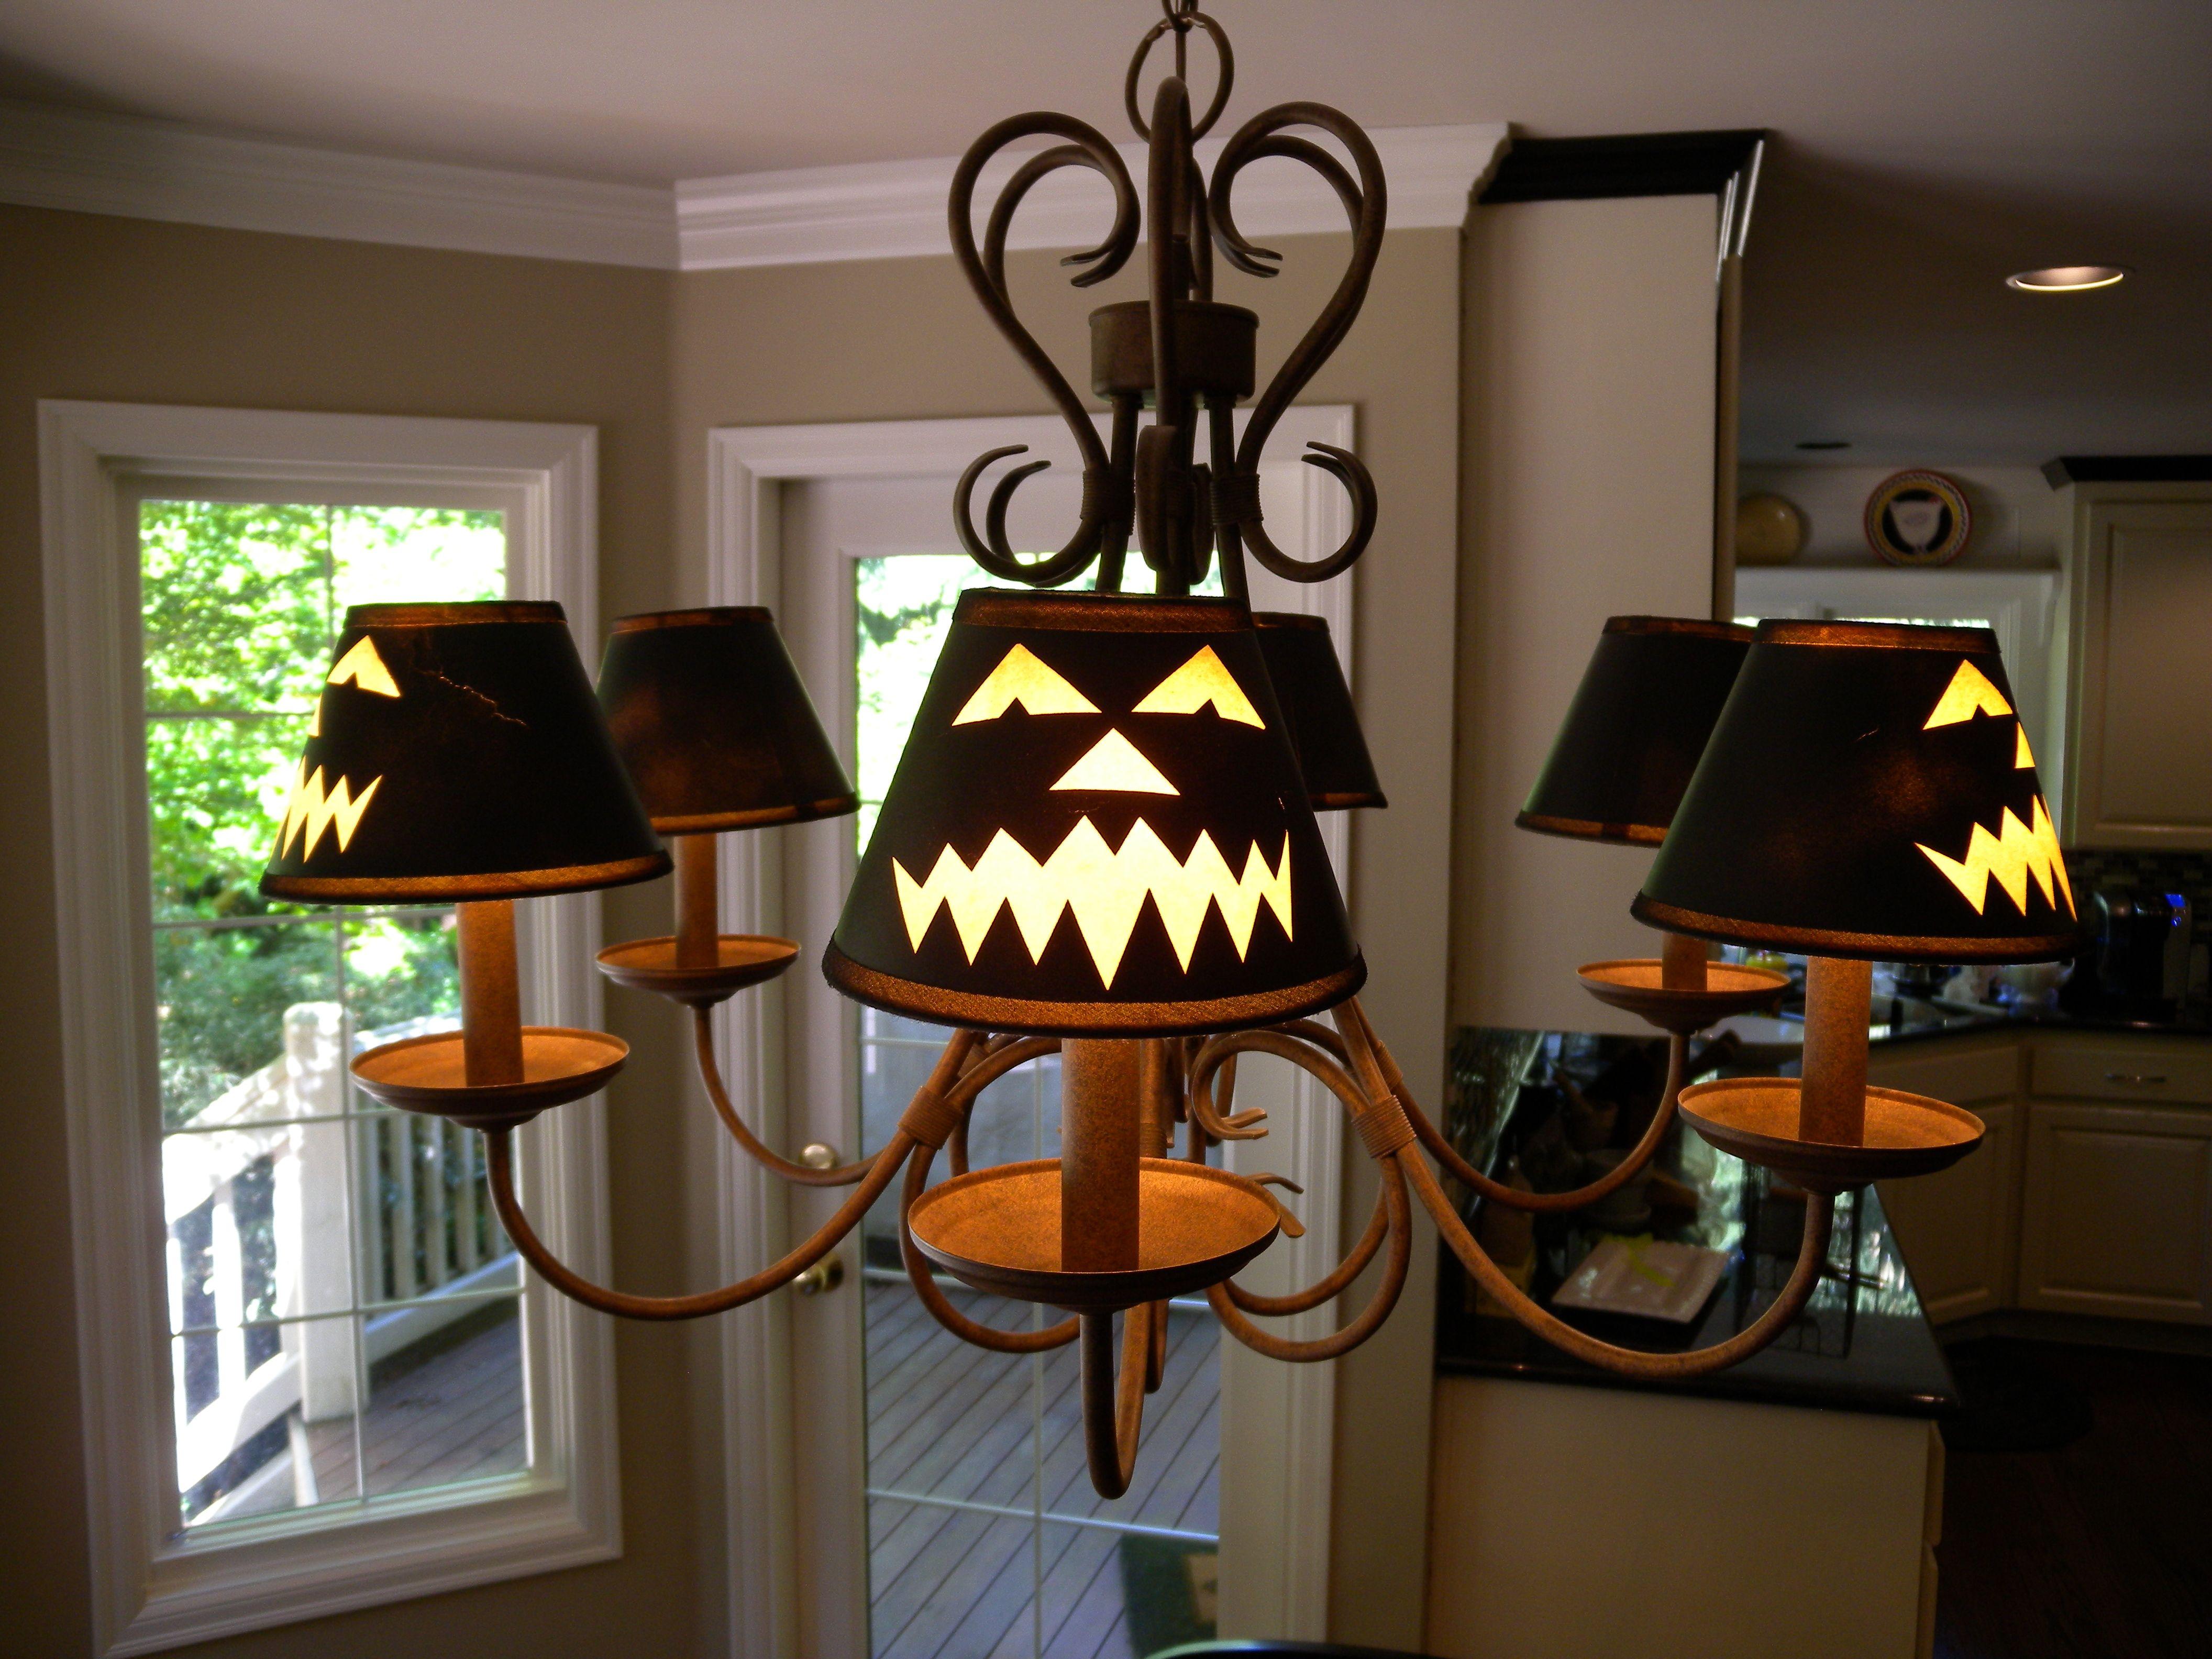 Ballard design inspired jack o lantern lamp shades craft ideas ballard design inspired jack o lantern lamp shades aloadofball Gallery